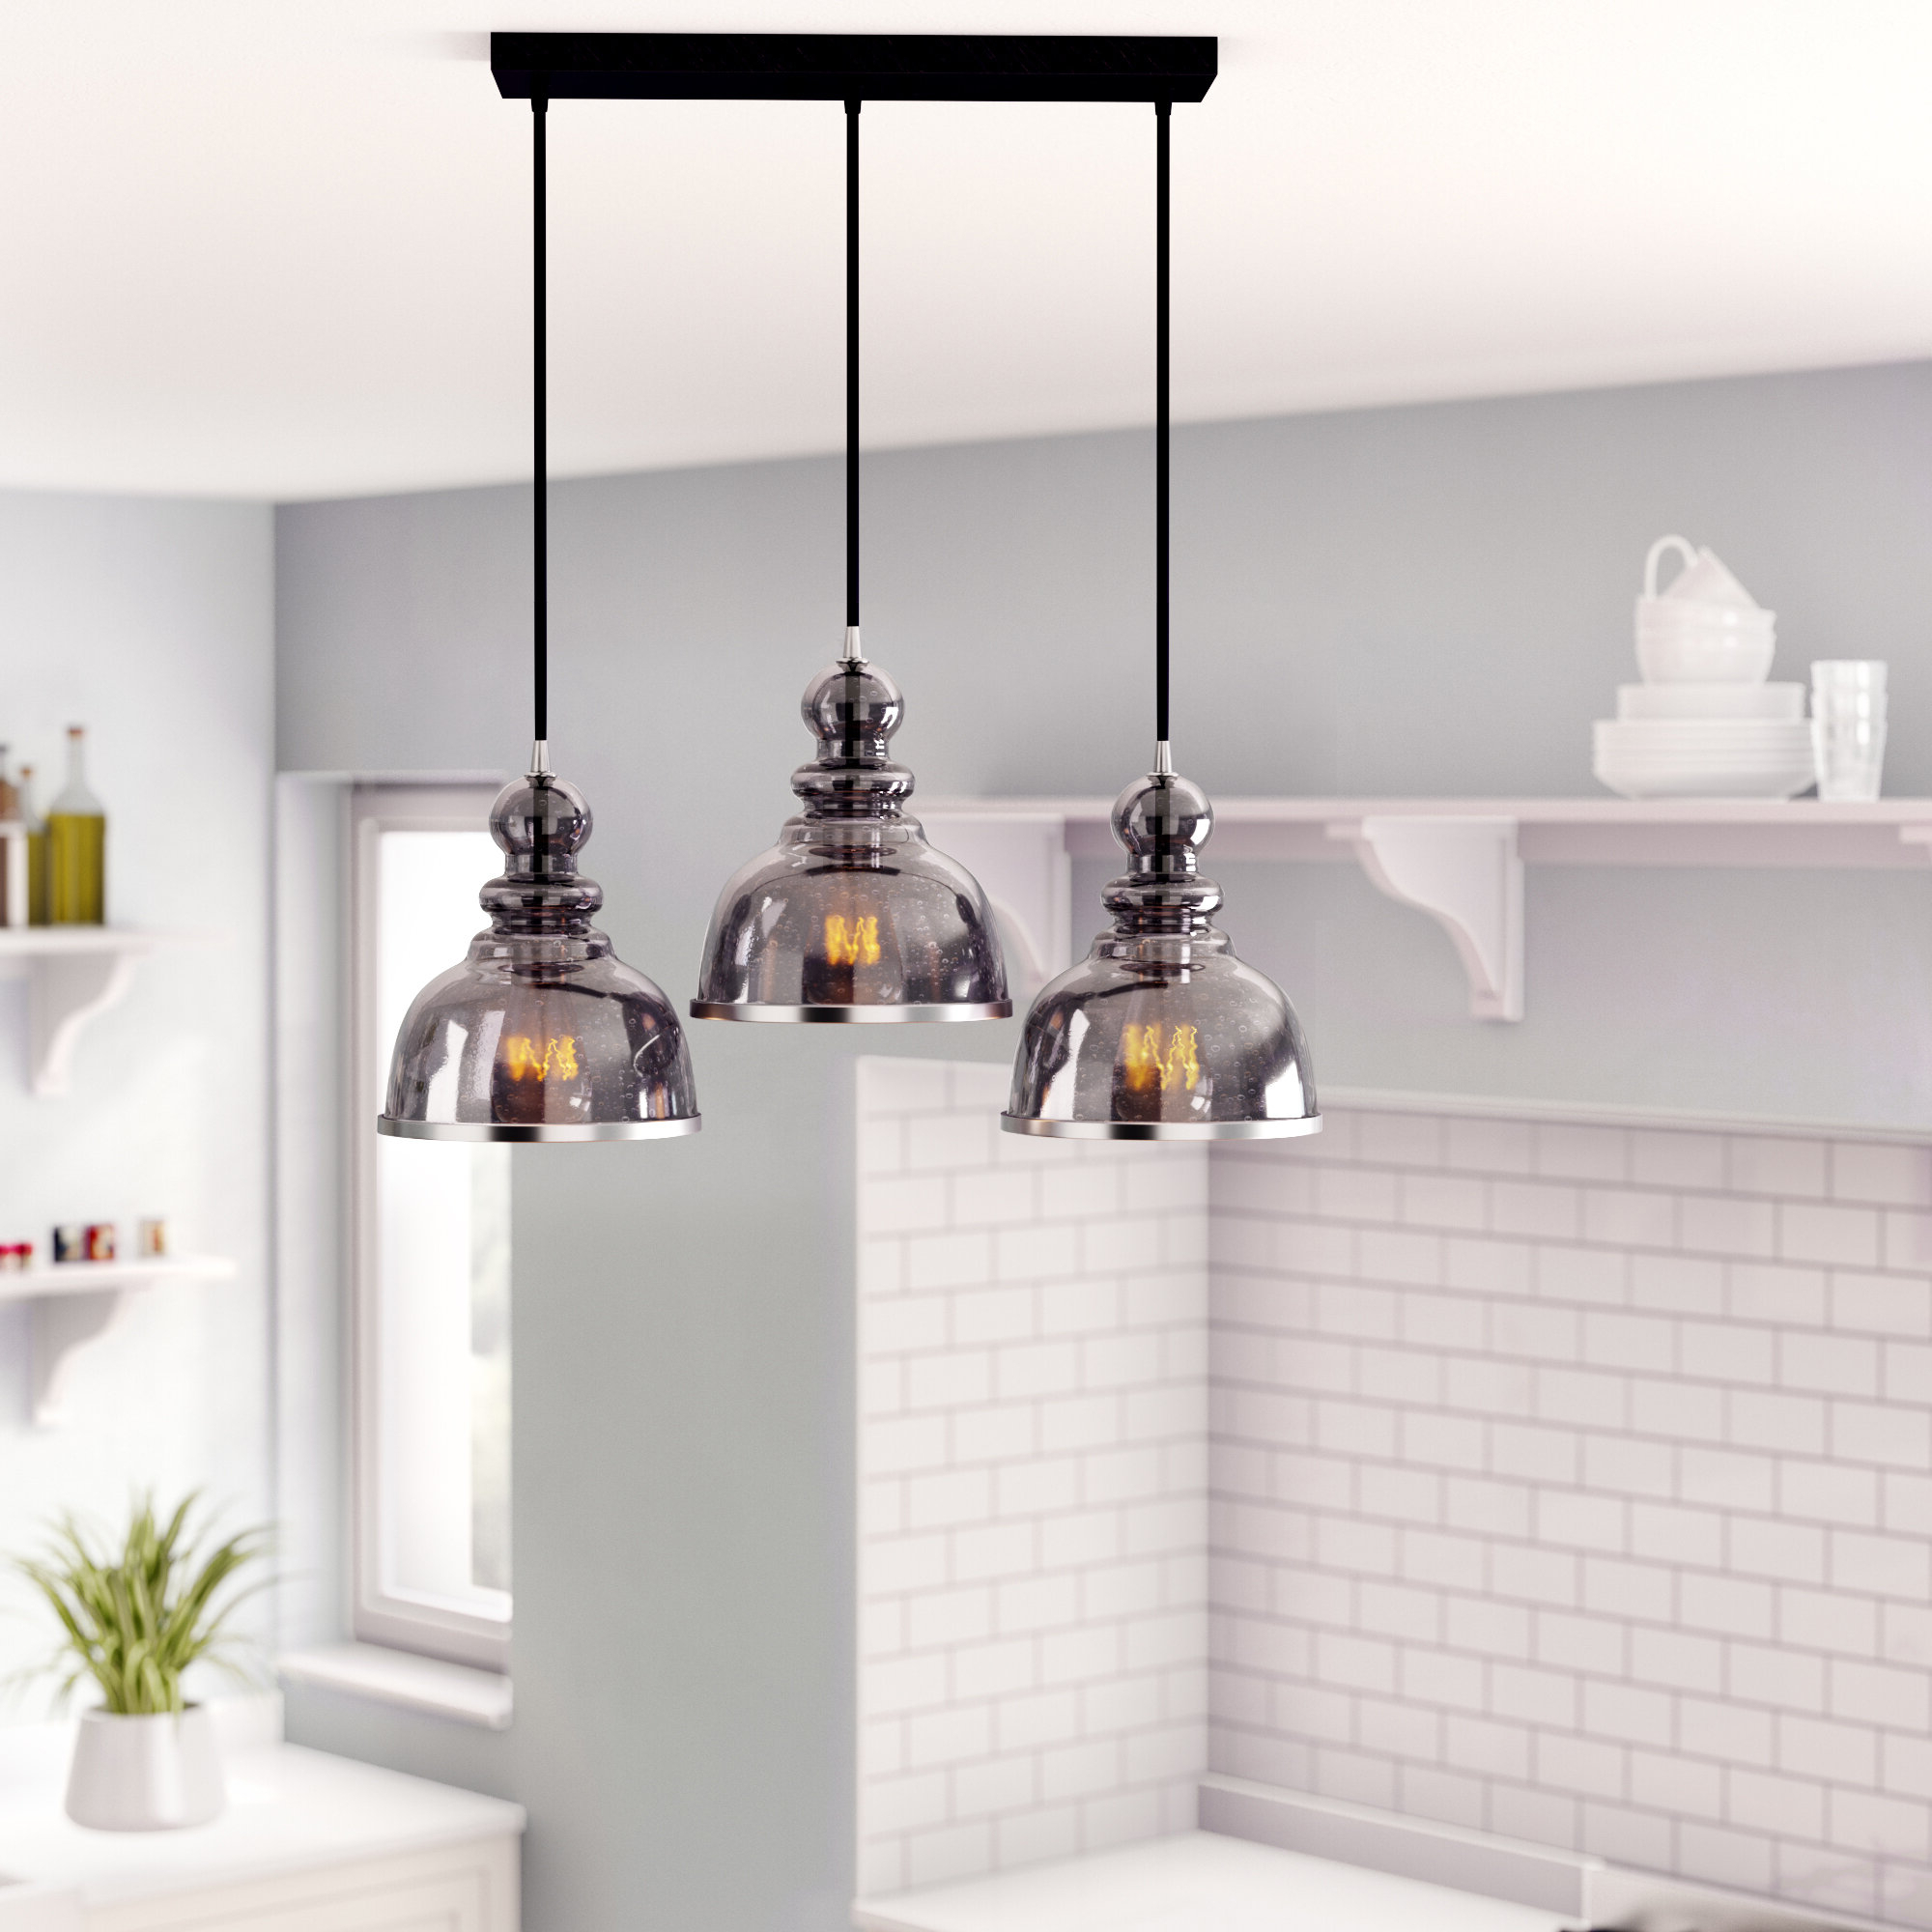 Humphries 3Light Kitchen Island Pendant Lighting Kitchen pertaining to Newest Dunson 3-Light Kitchen Island Pendants